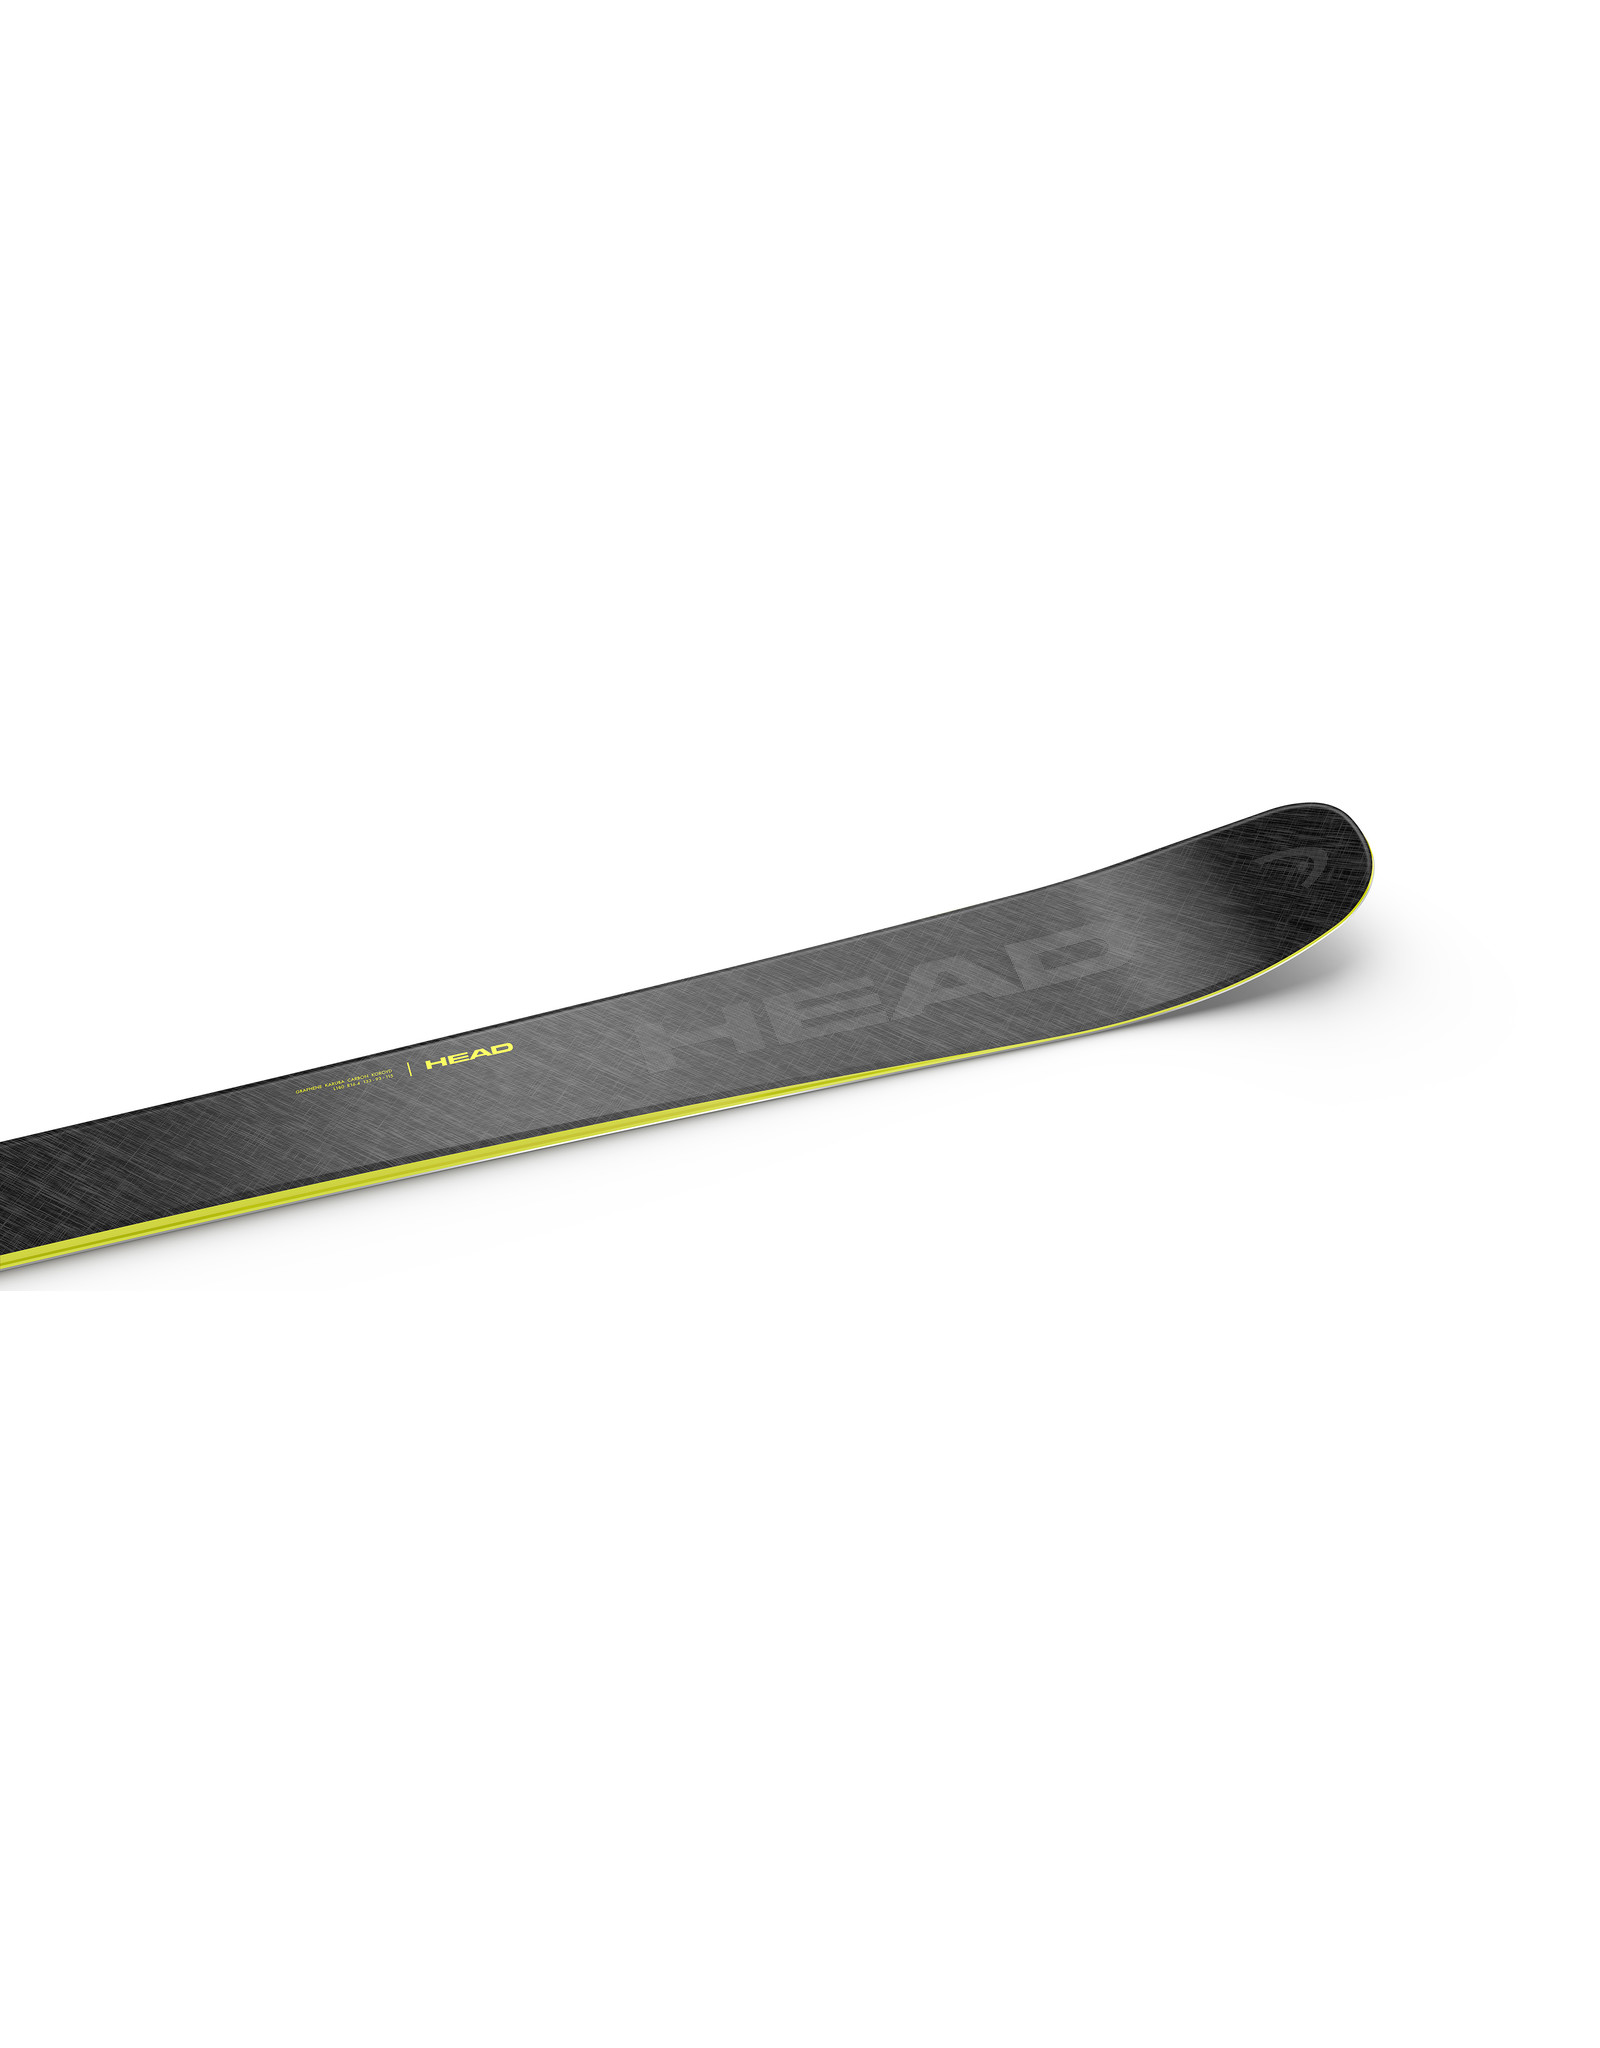 Head Head Men's Kore 93 Flat Ski 2021